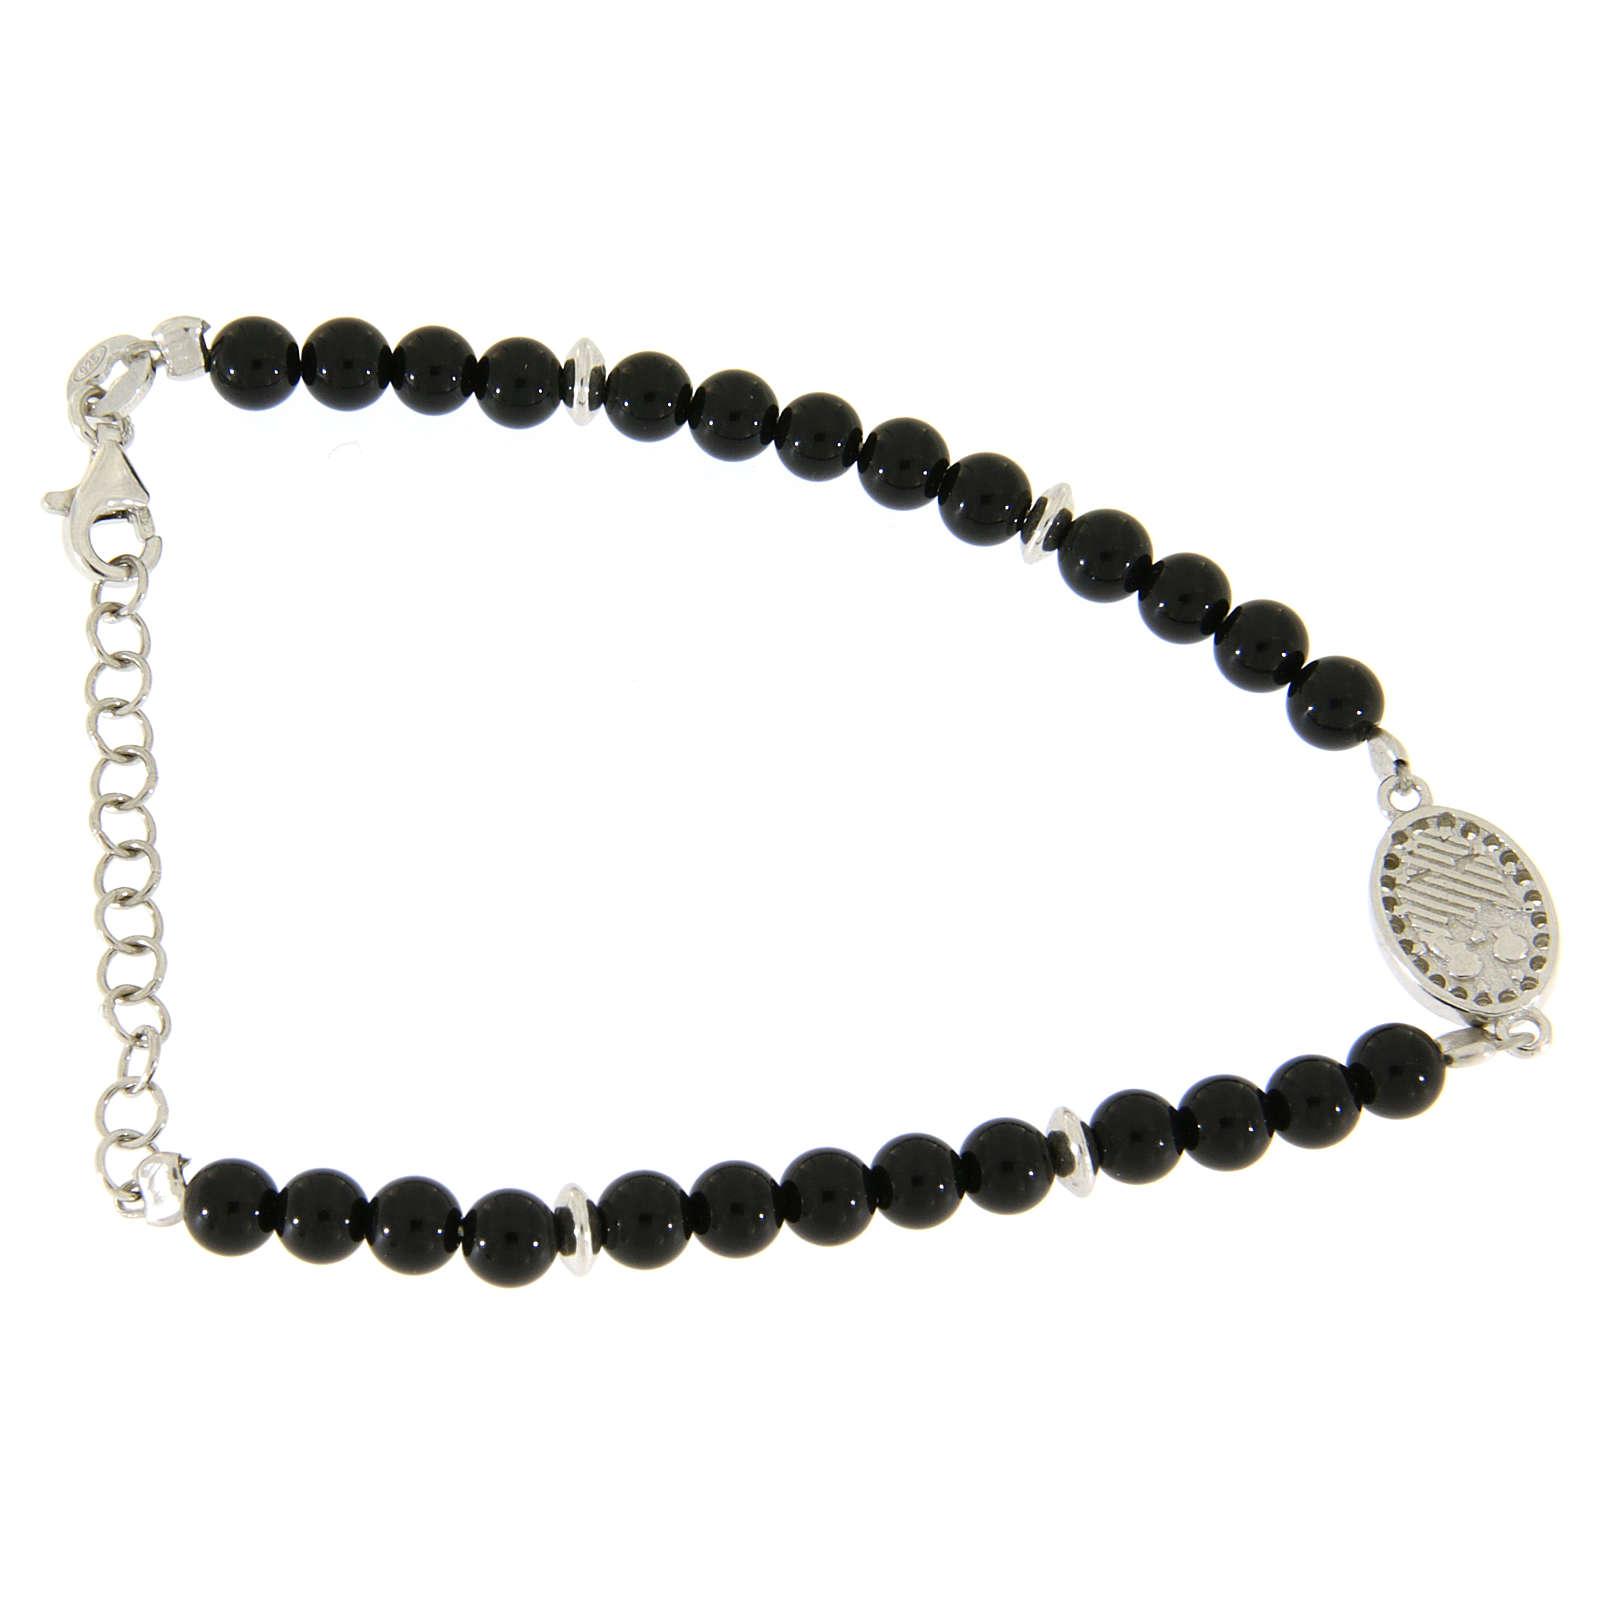 Bracciale perline nere onice, inserto medaglietta S. Rita zirconi bianchi 4